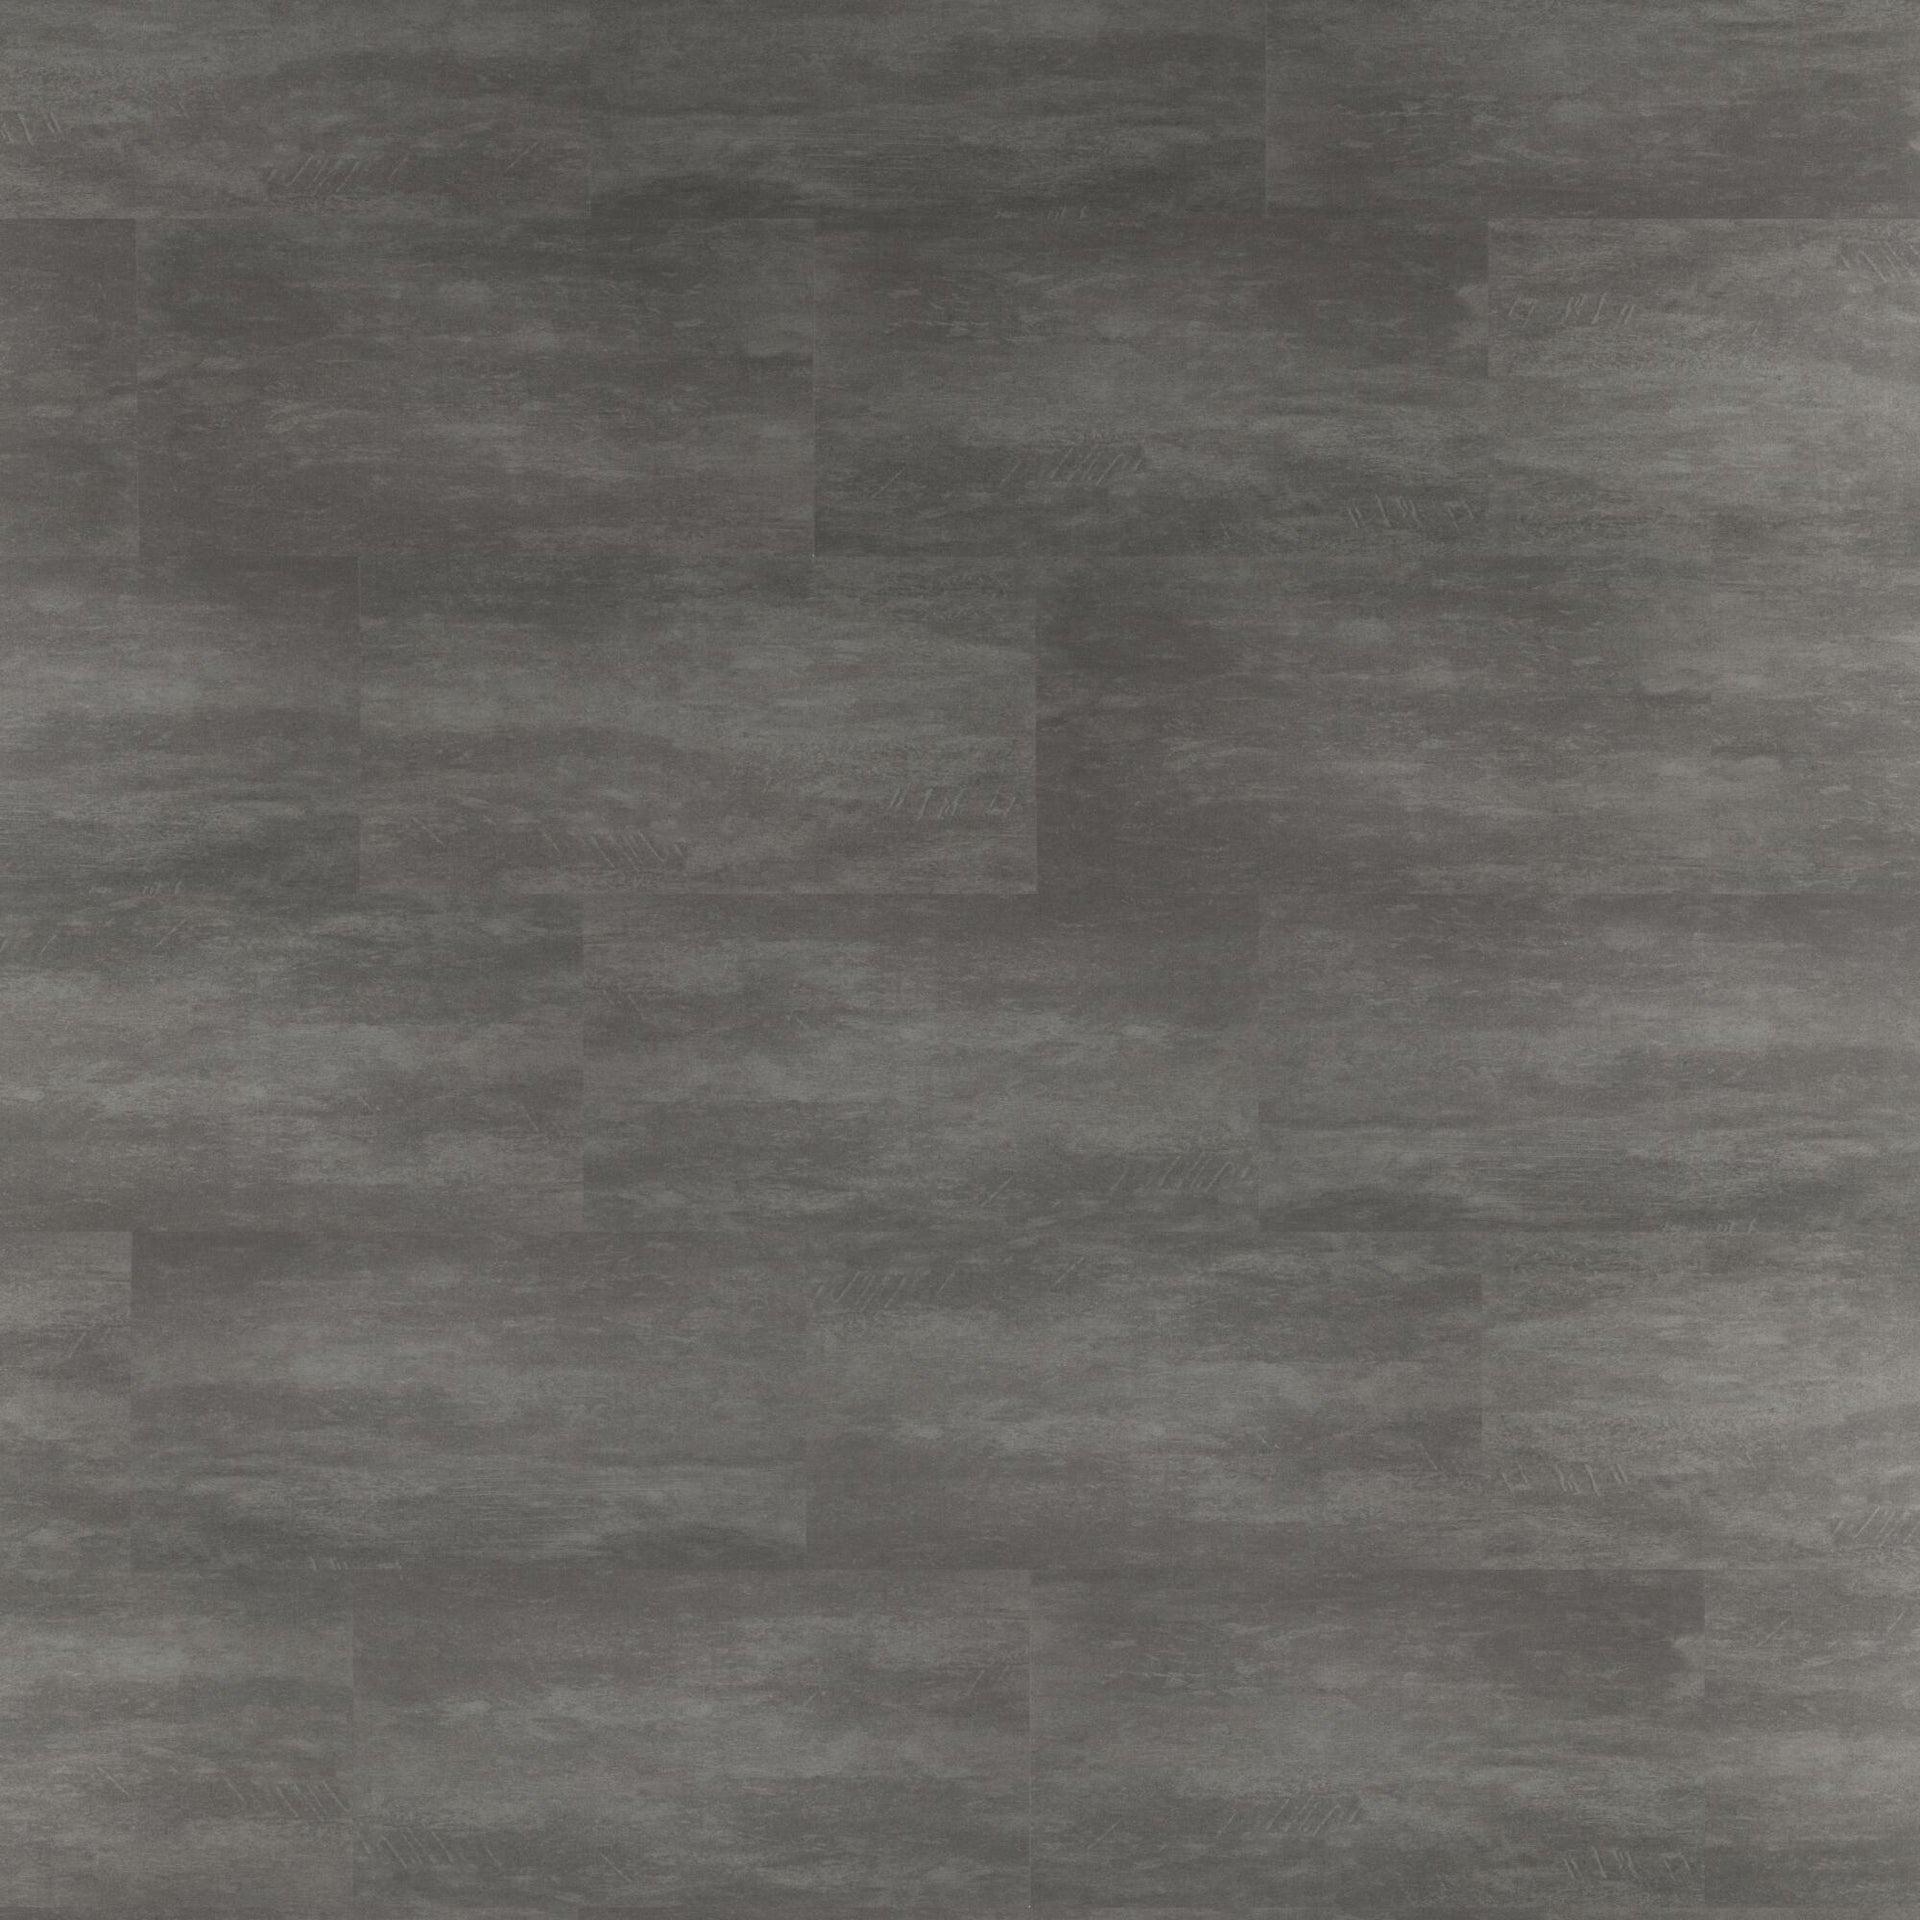 Pavimento PVC incastro Tolu Sp 4 mm grigio / argento - 18